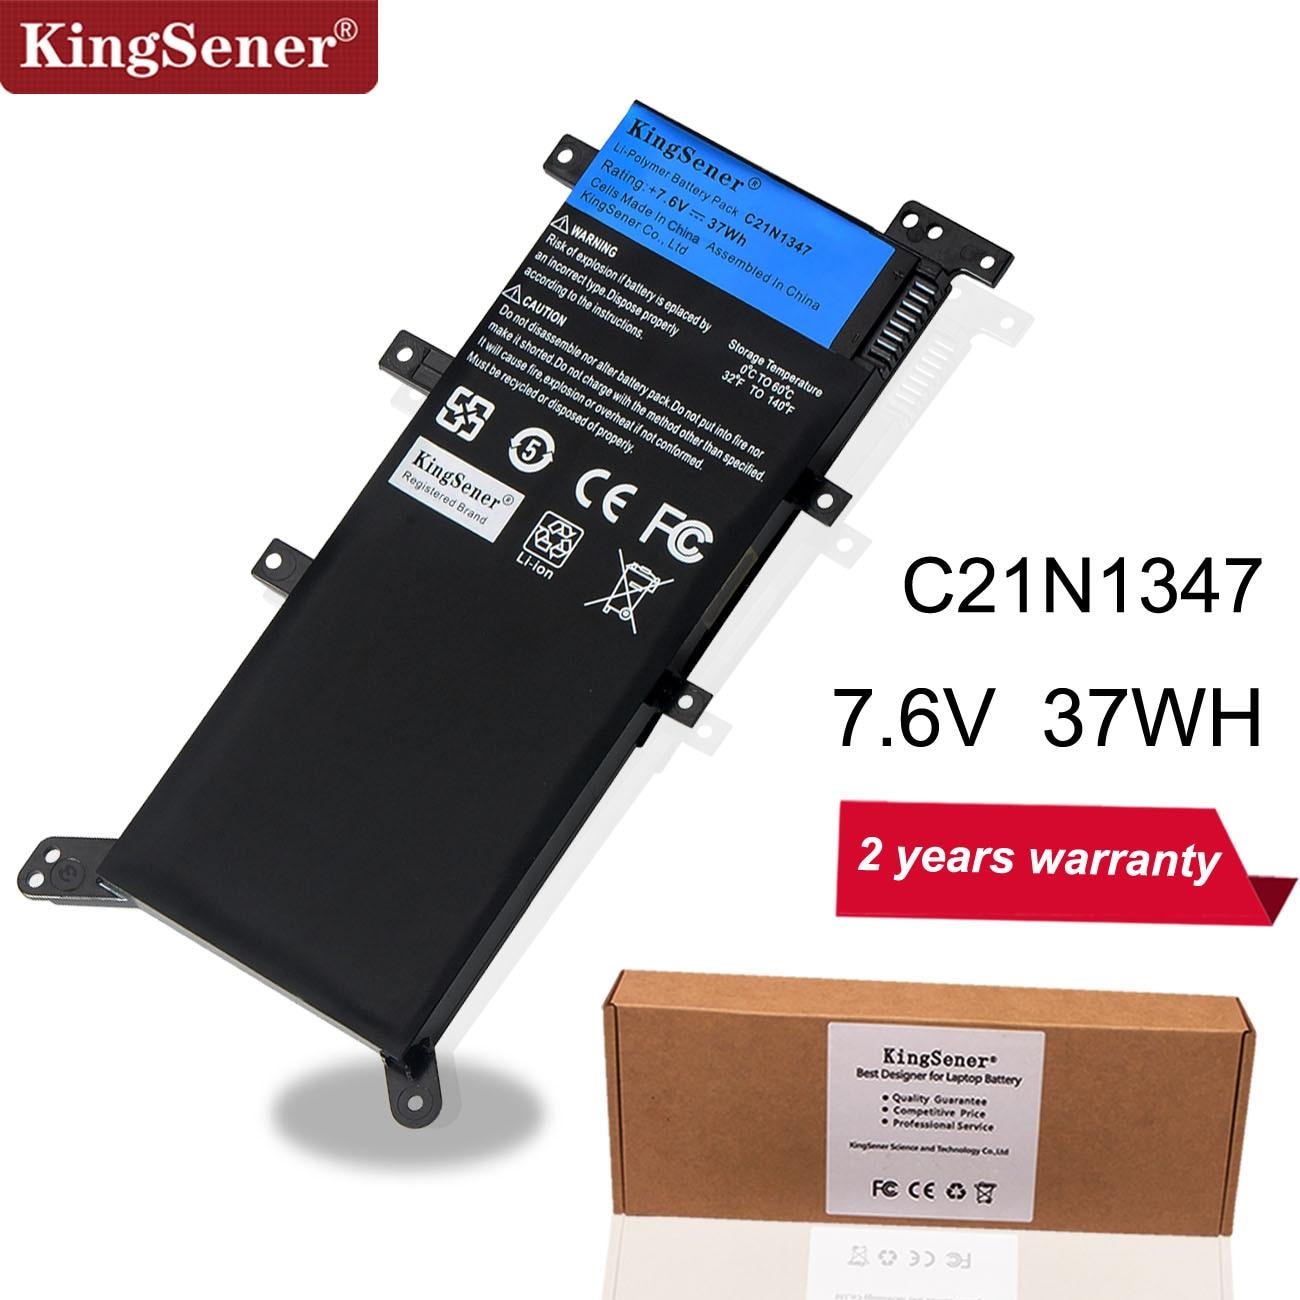 7,5 V 37WH KingSener C21N1347 Neue Laptop Batterie Für ASUS X554L X555 X555L X555LA X555LD X555LN X555MA 2ICP4/63 /134 C21N1347